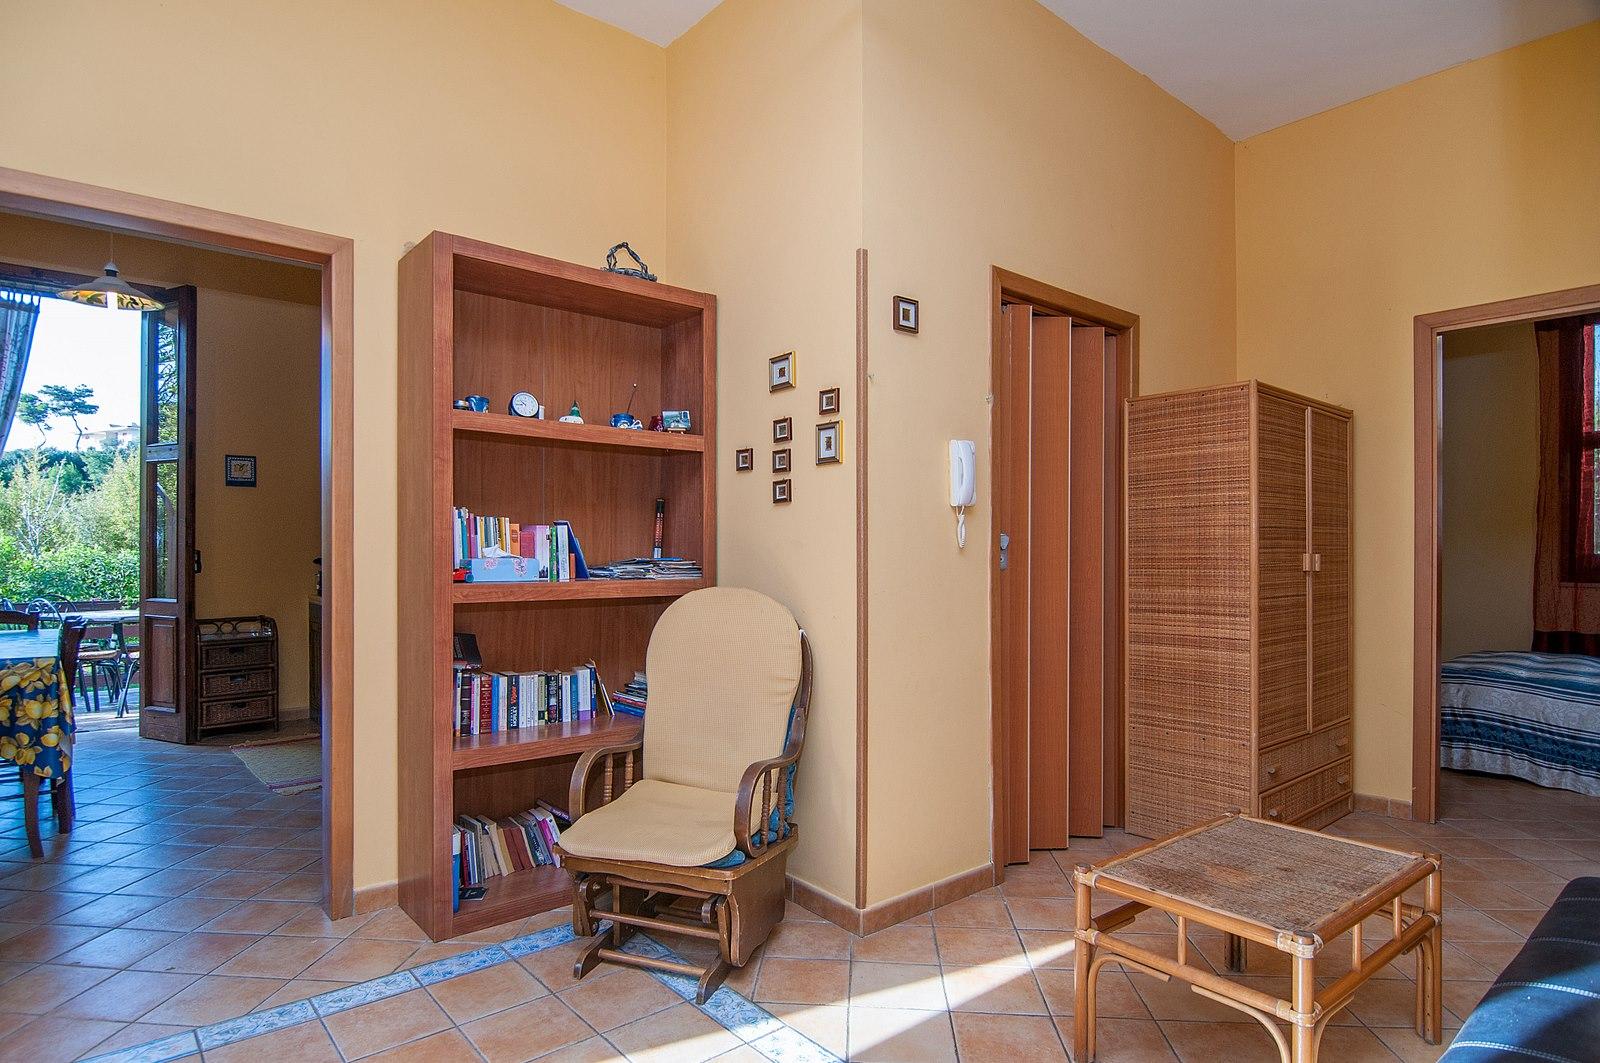 Maison de vacances Villetta a Lido (1540086), Lido di Noto, Siracusa, Sicile, Italie, image 16